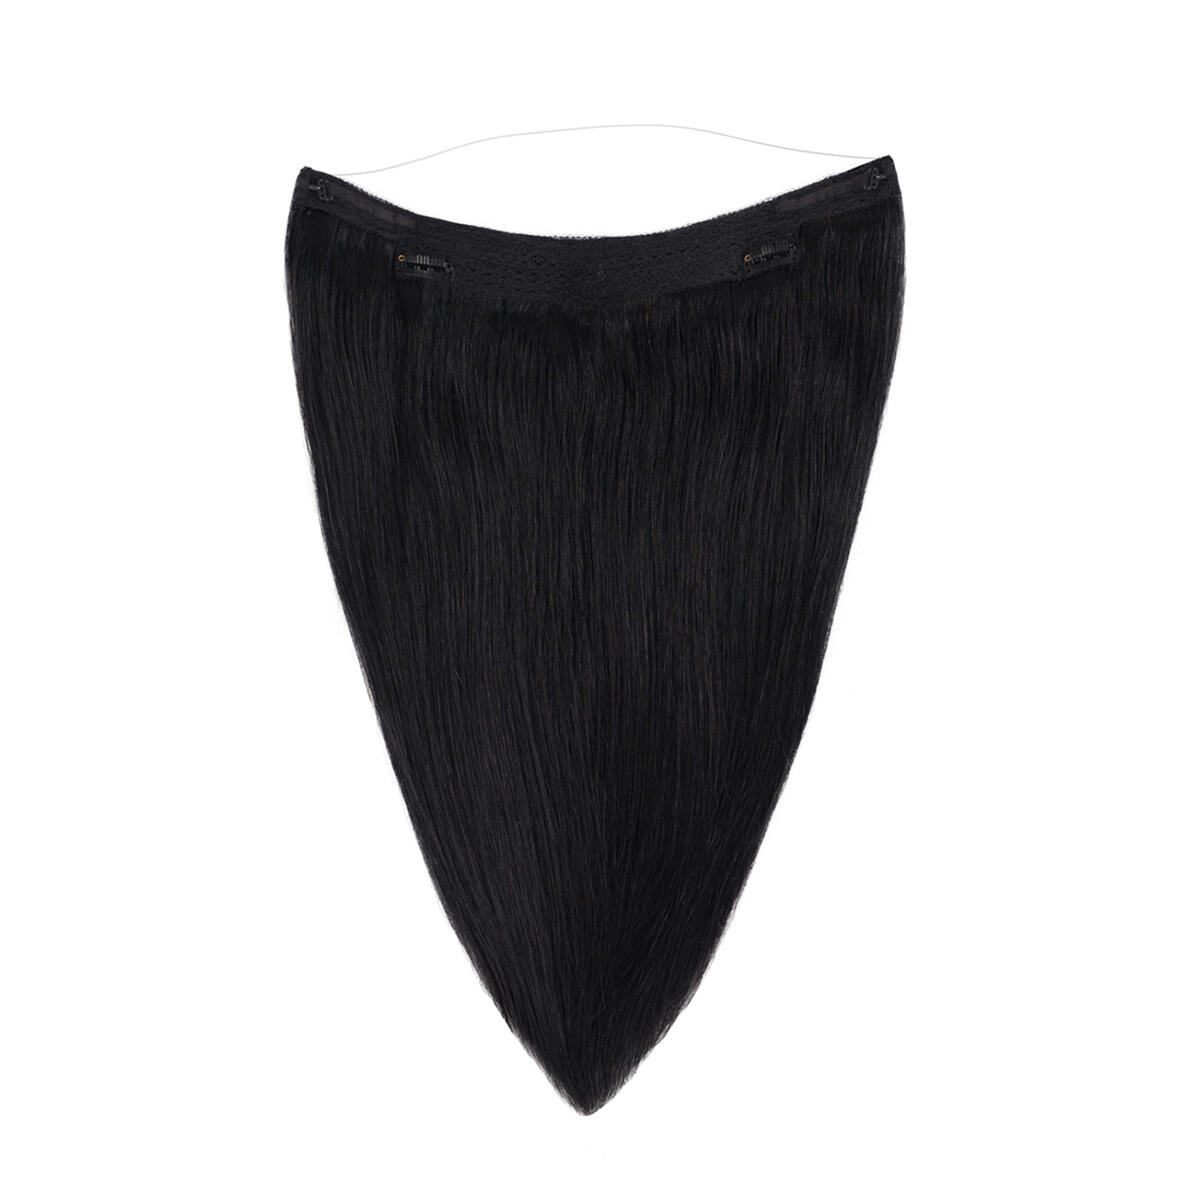 Hairband Original 1.0 Black 45 cm